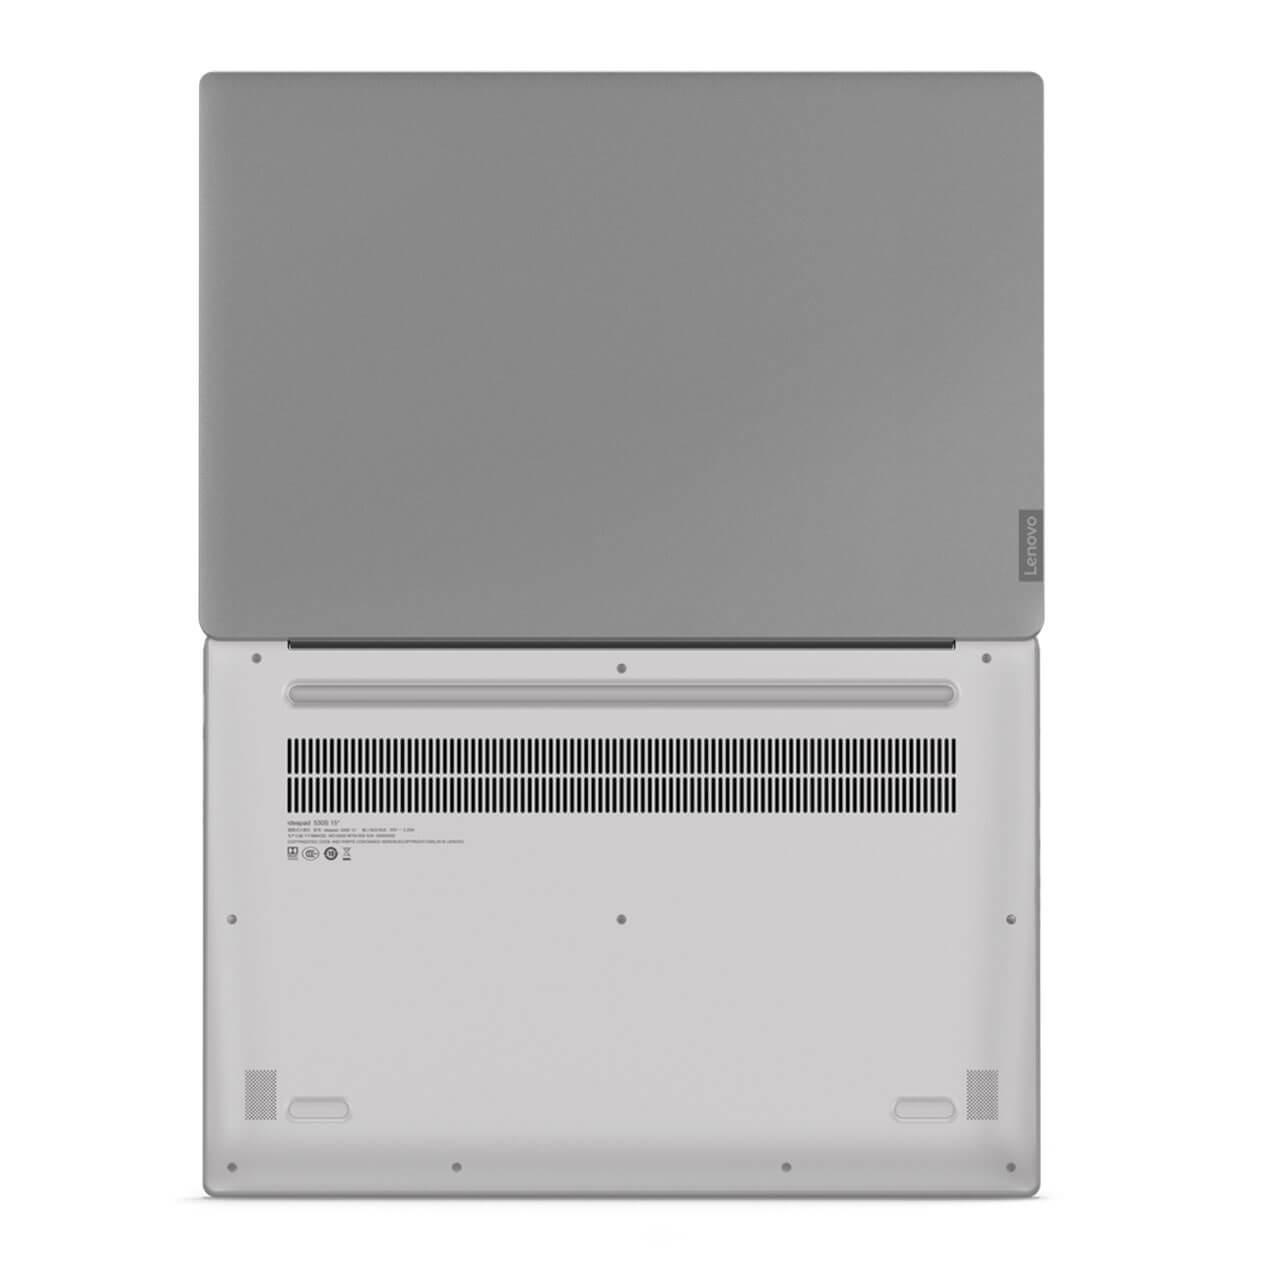 "Lenovo Ideapad 530S, 15.6"", i7-8550U, 8 GB RAM, 512GB SSD, Win 10 Home 64 8"